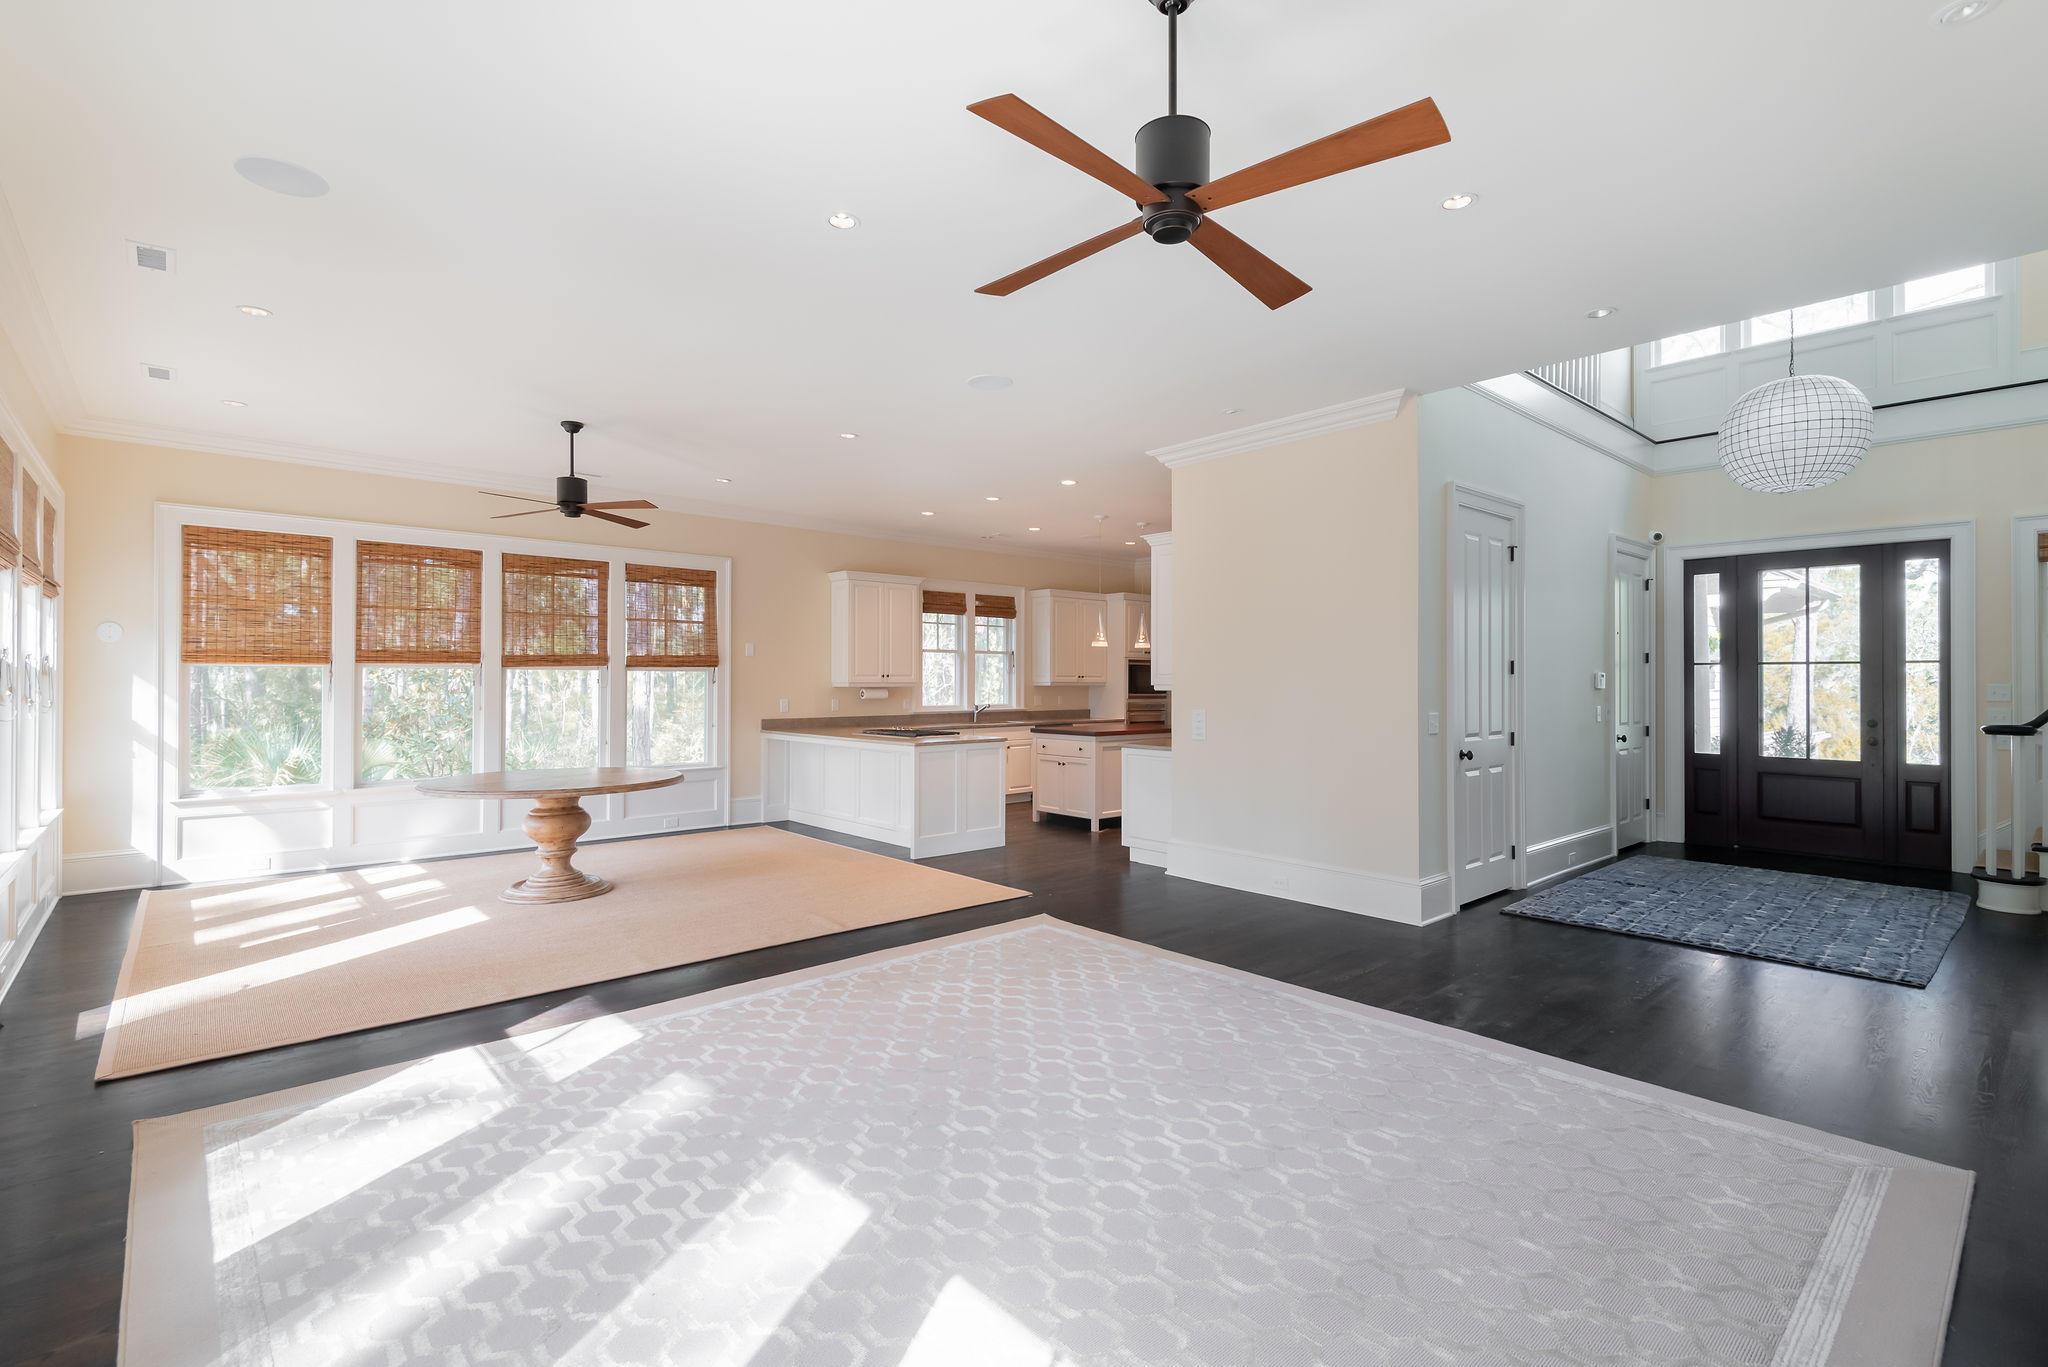 Kiawah Island Homes For Sale - 3 Grey Widgeon, Kiawah Island, SC - 61